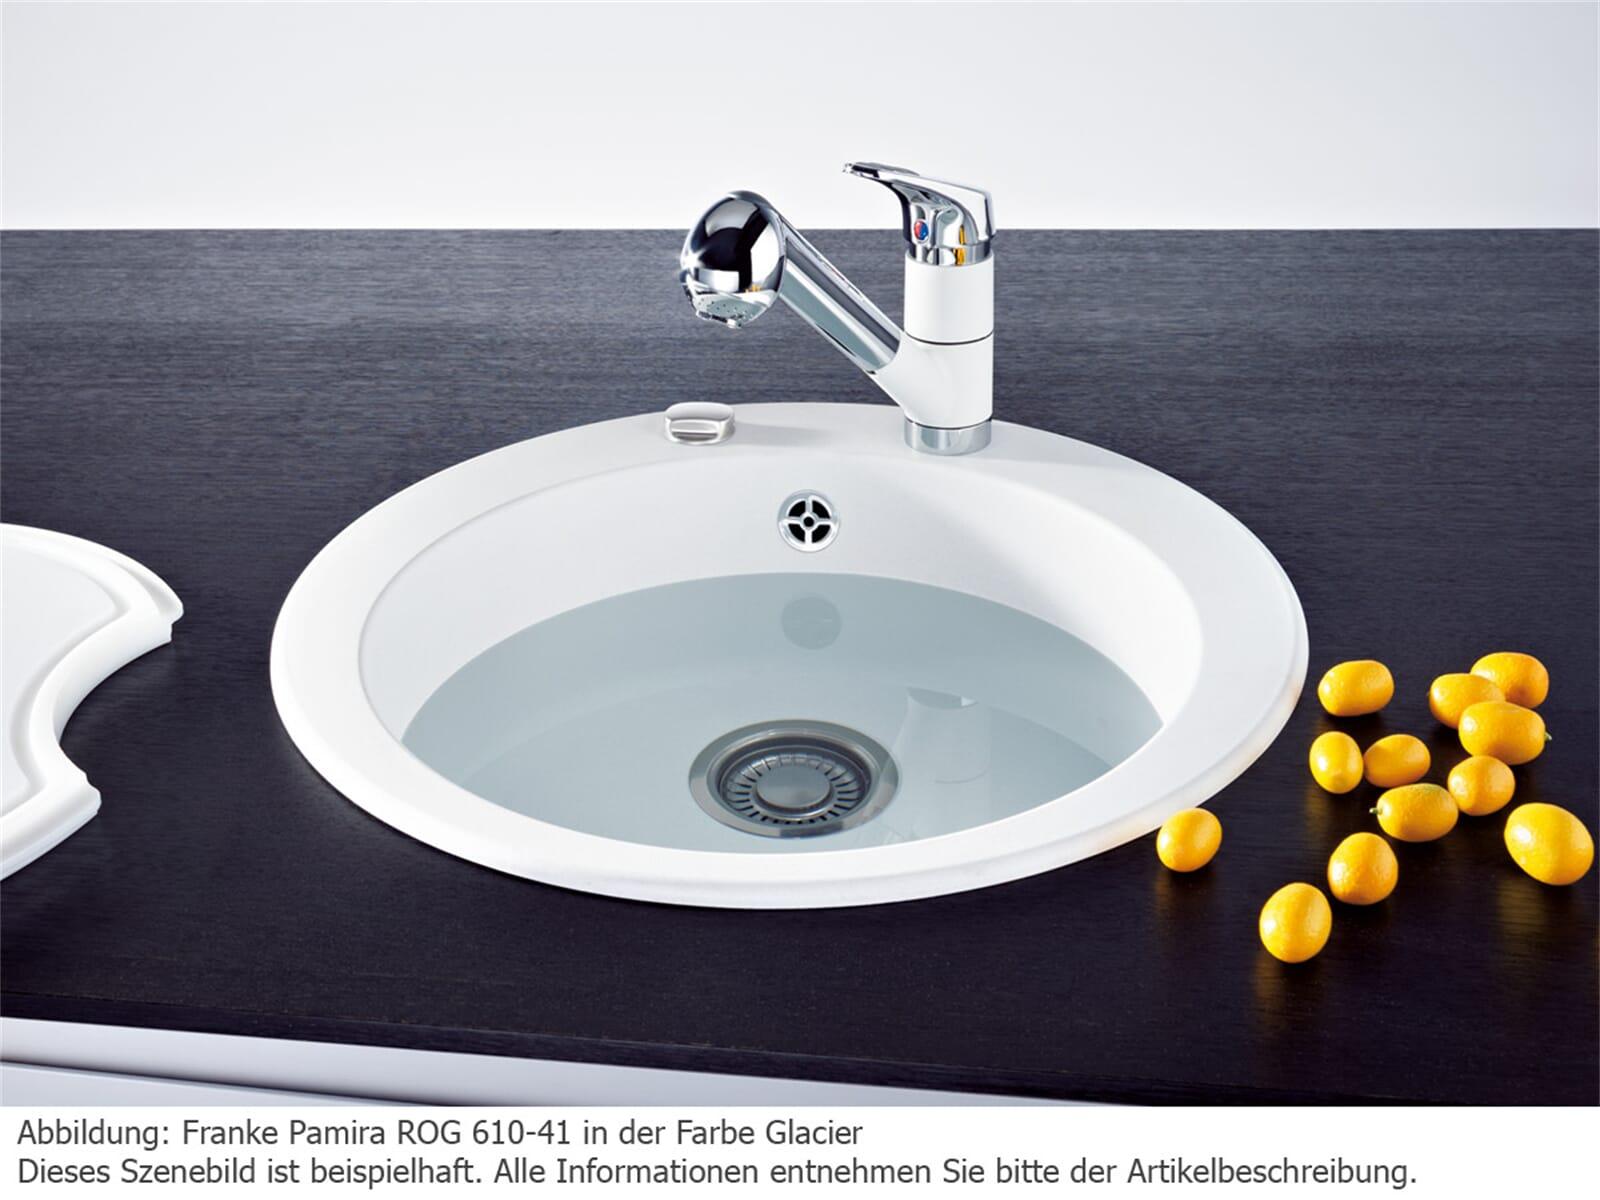 Franke Pamira ROG 610-41 Onyx Granitspüle